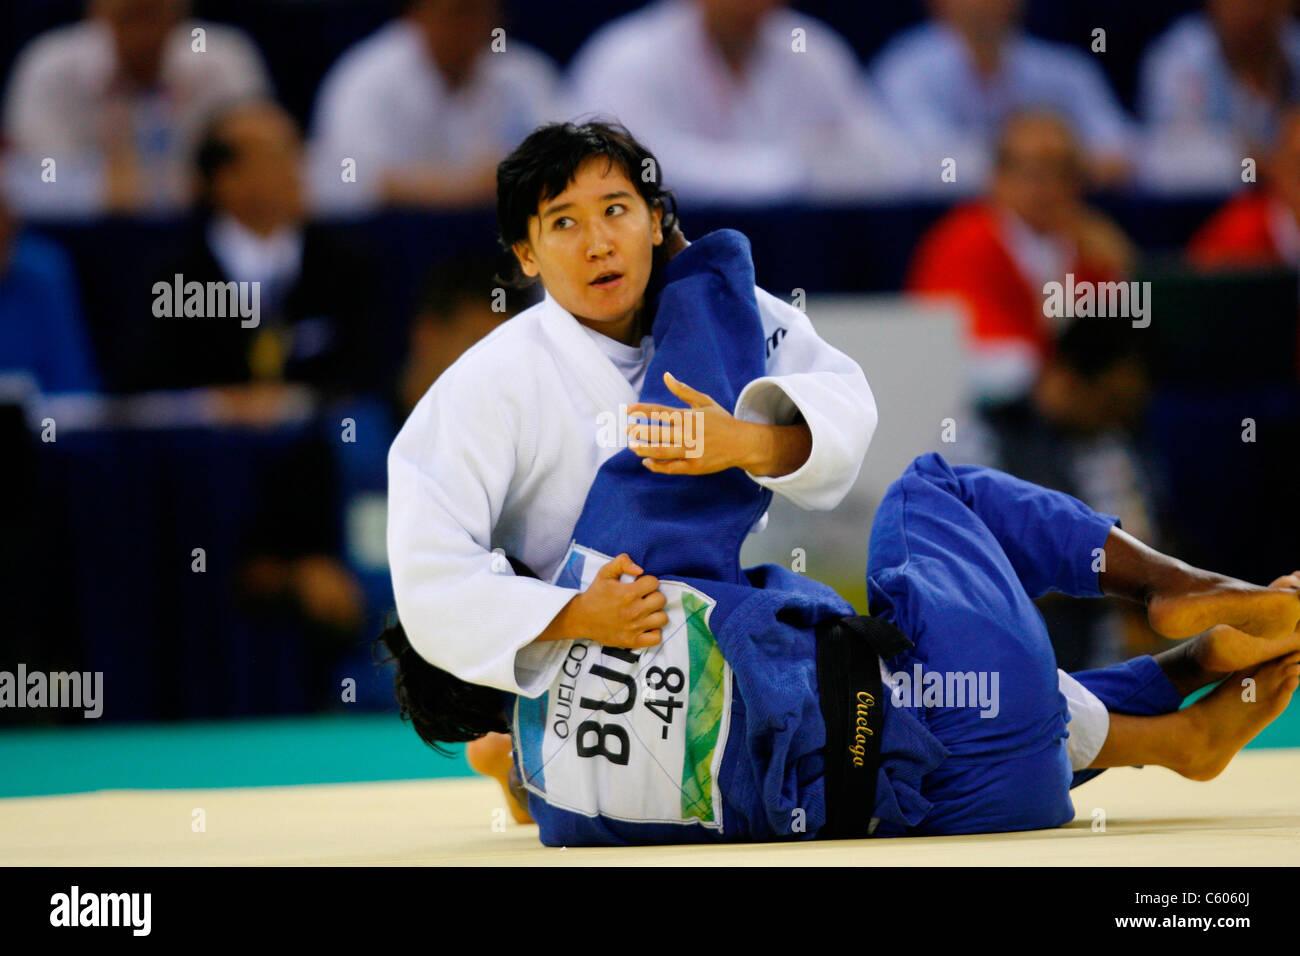 HANATOU OUELOGO KELBET NURGAZ W0MENS -48KG JUDO OLYMPIC STADIUM BEIJING CHINA 09 August 2008 - Stock Image